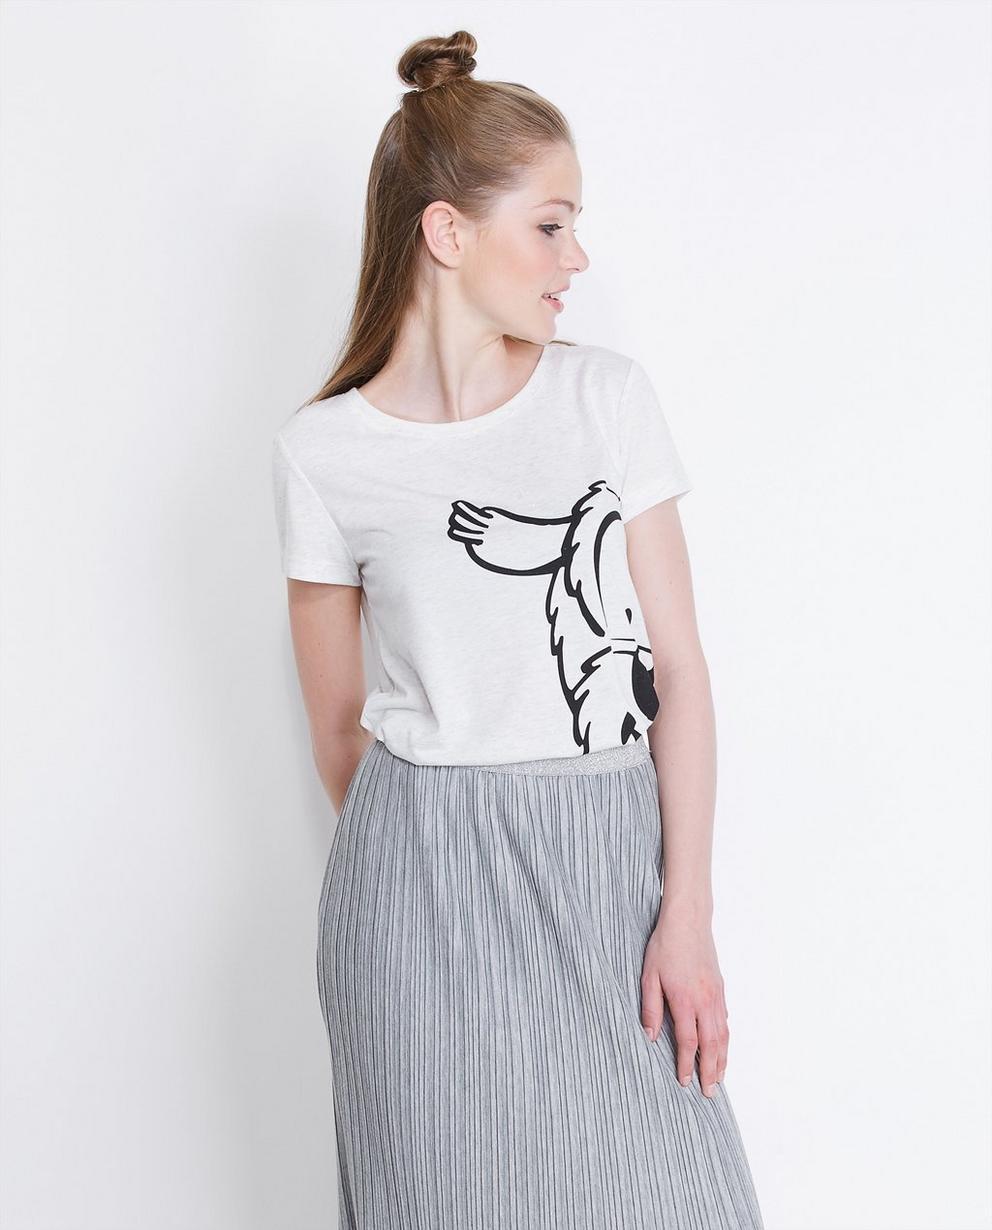 T-shirt met Samsonprint - Samson Vintage - Samson